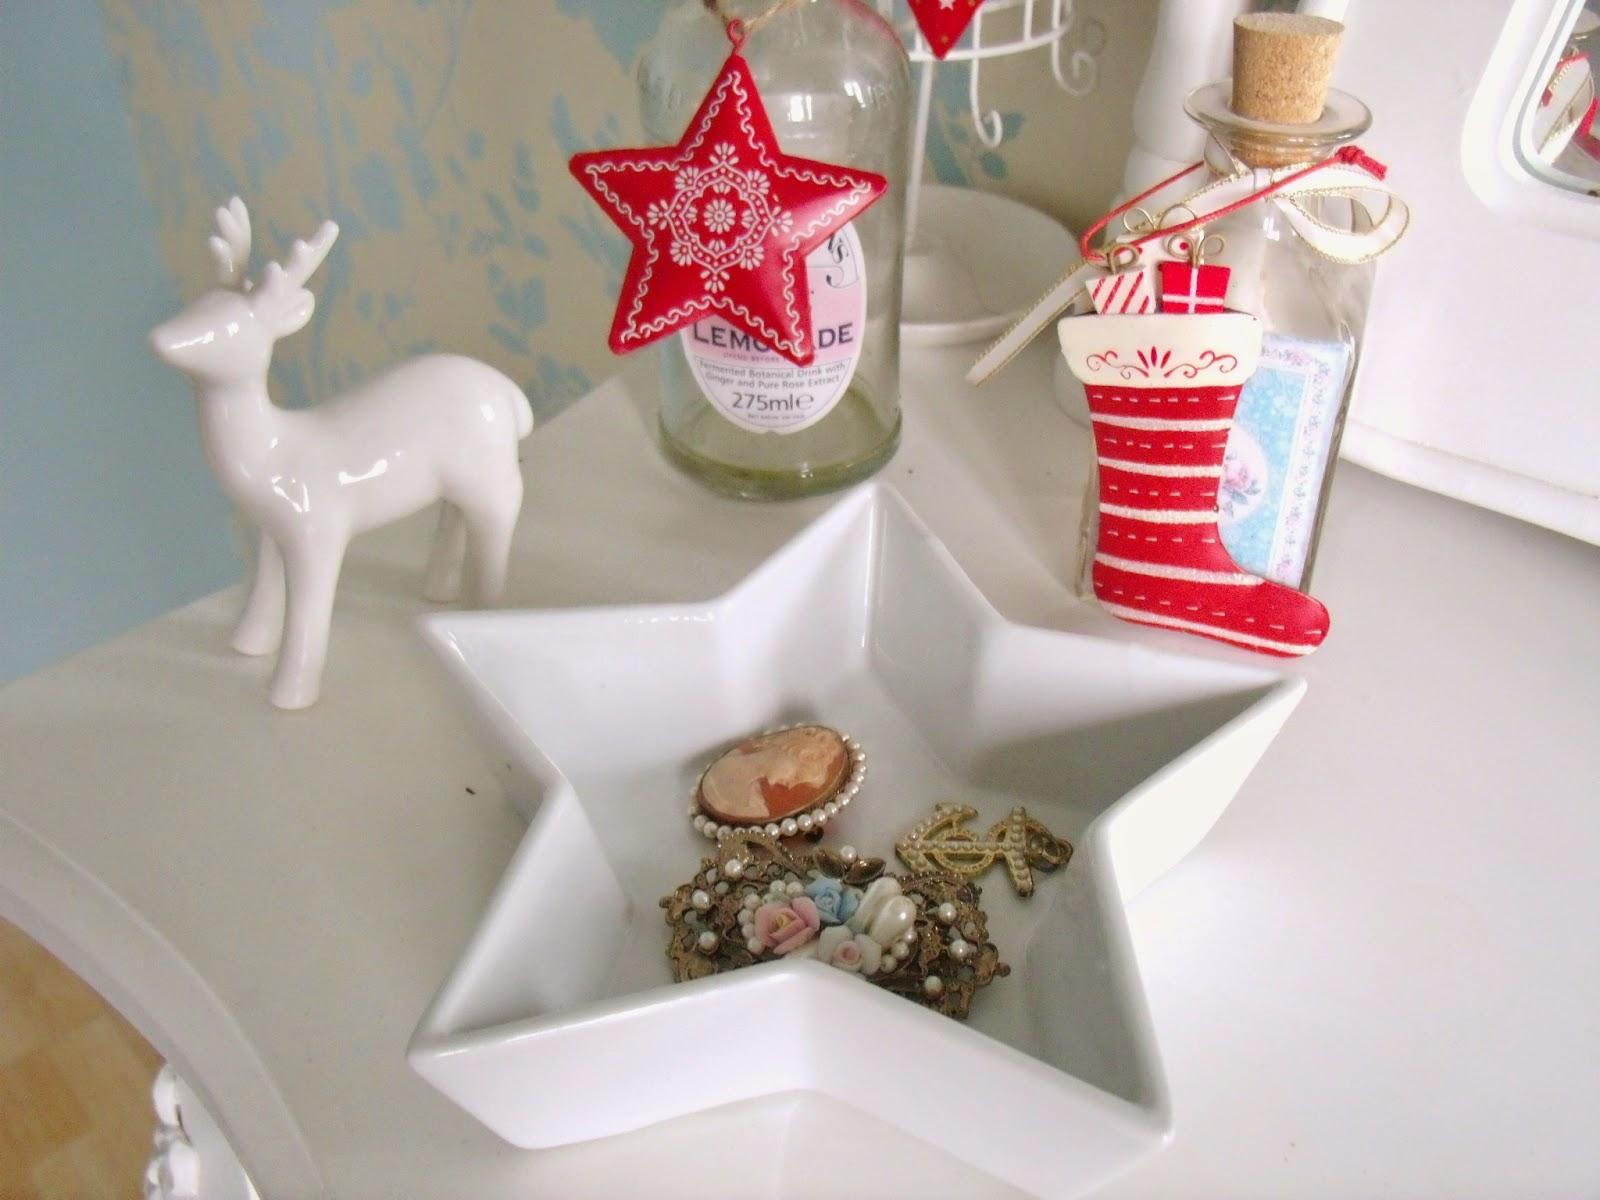 Poundland christmas buys victoria 39 s vintage travel for Sia home fashion christmas decorations